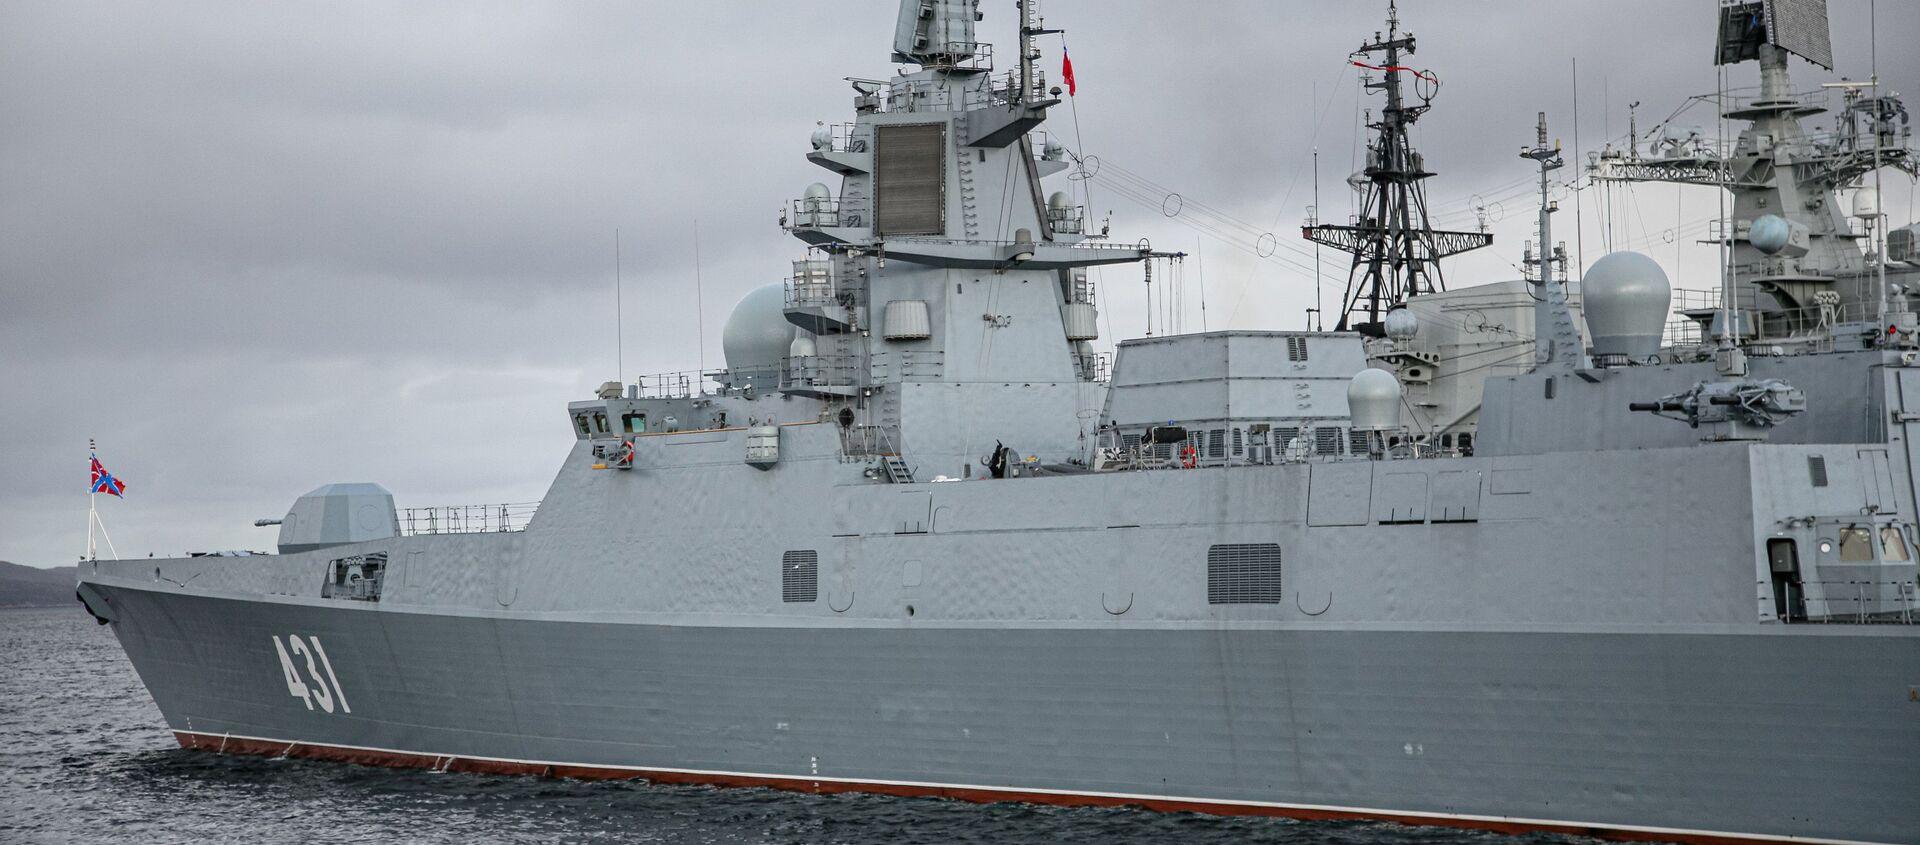 "Fregata projektu 22350 ""Admirał Kasatonow"". - Sputnik Polska, 1920, 01.04.2021"